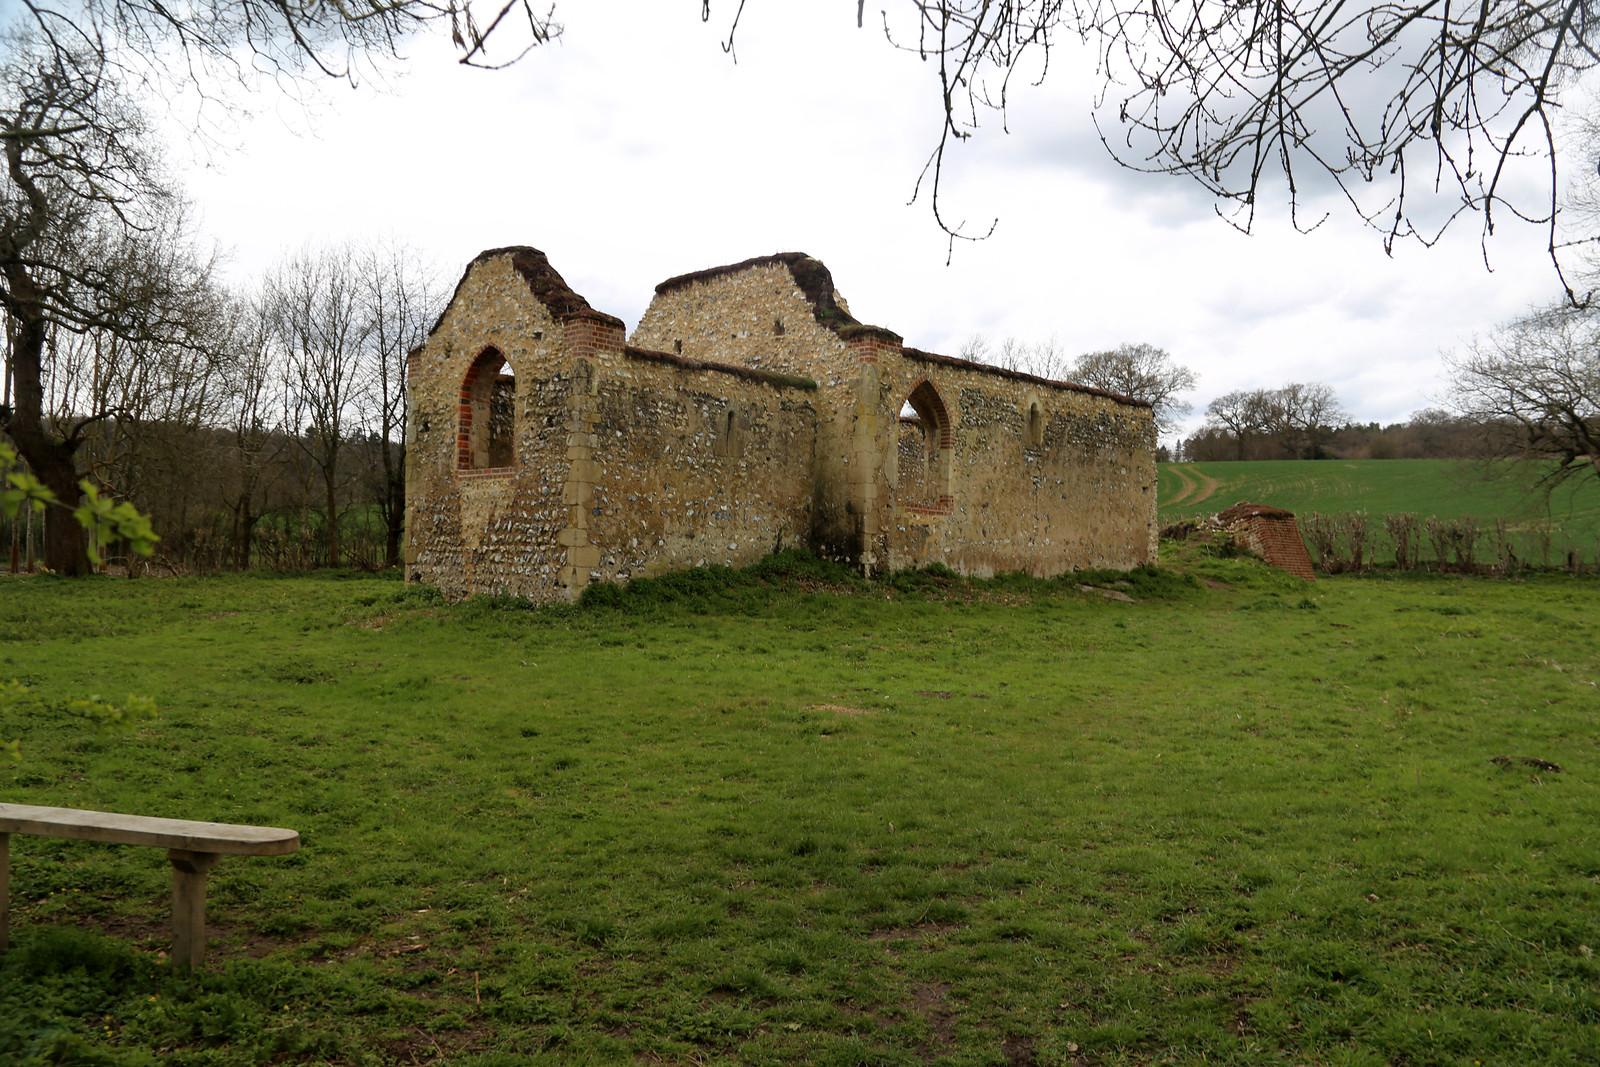 Remains of St James Church near Bix